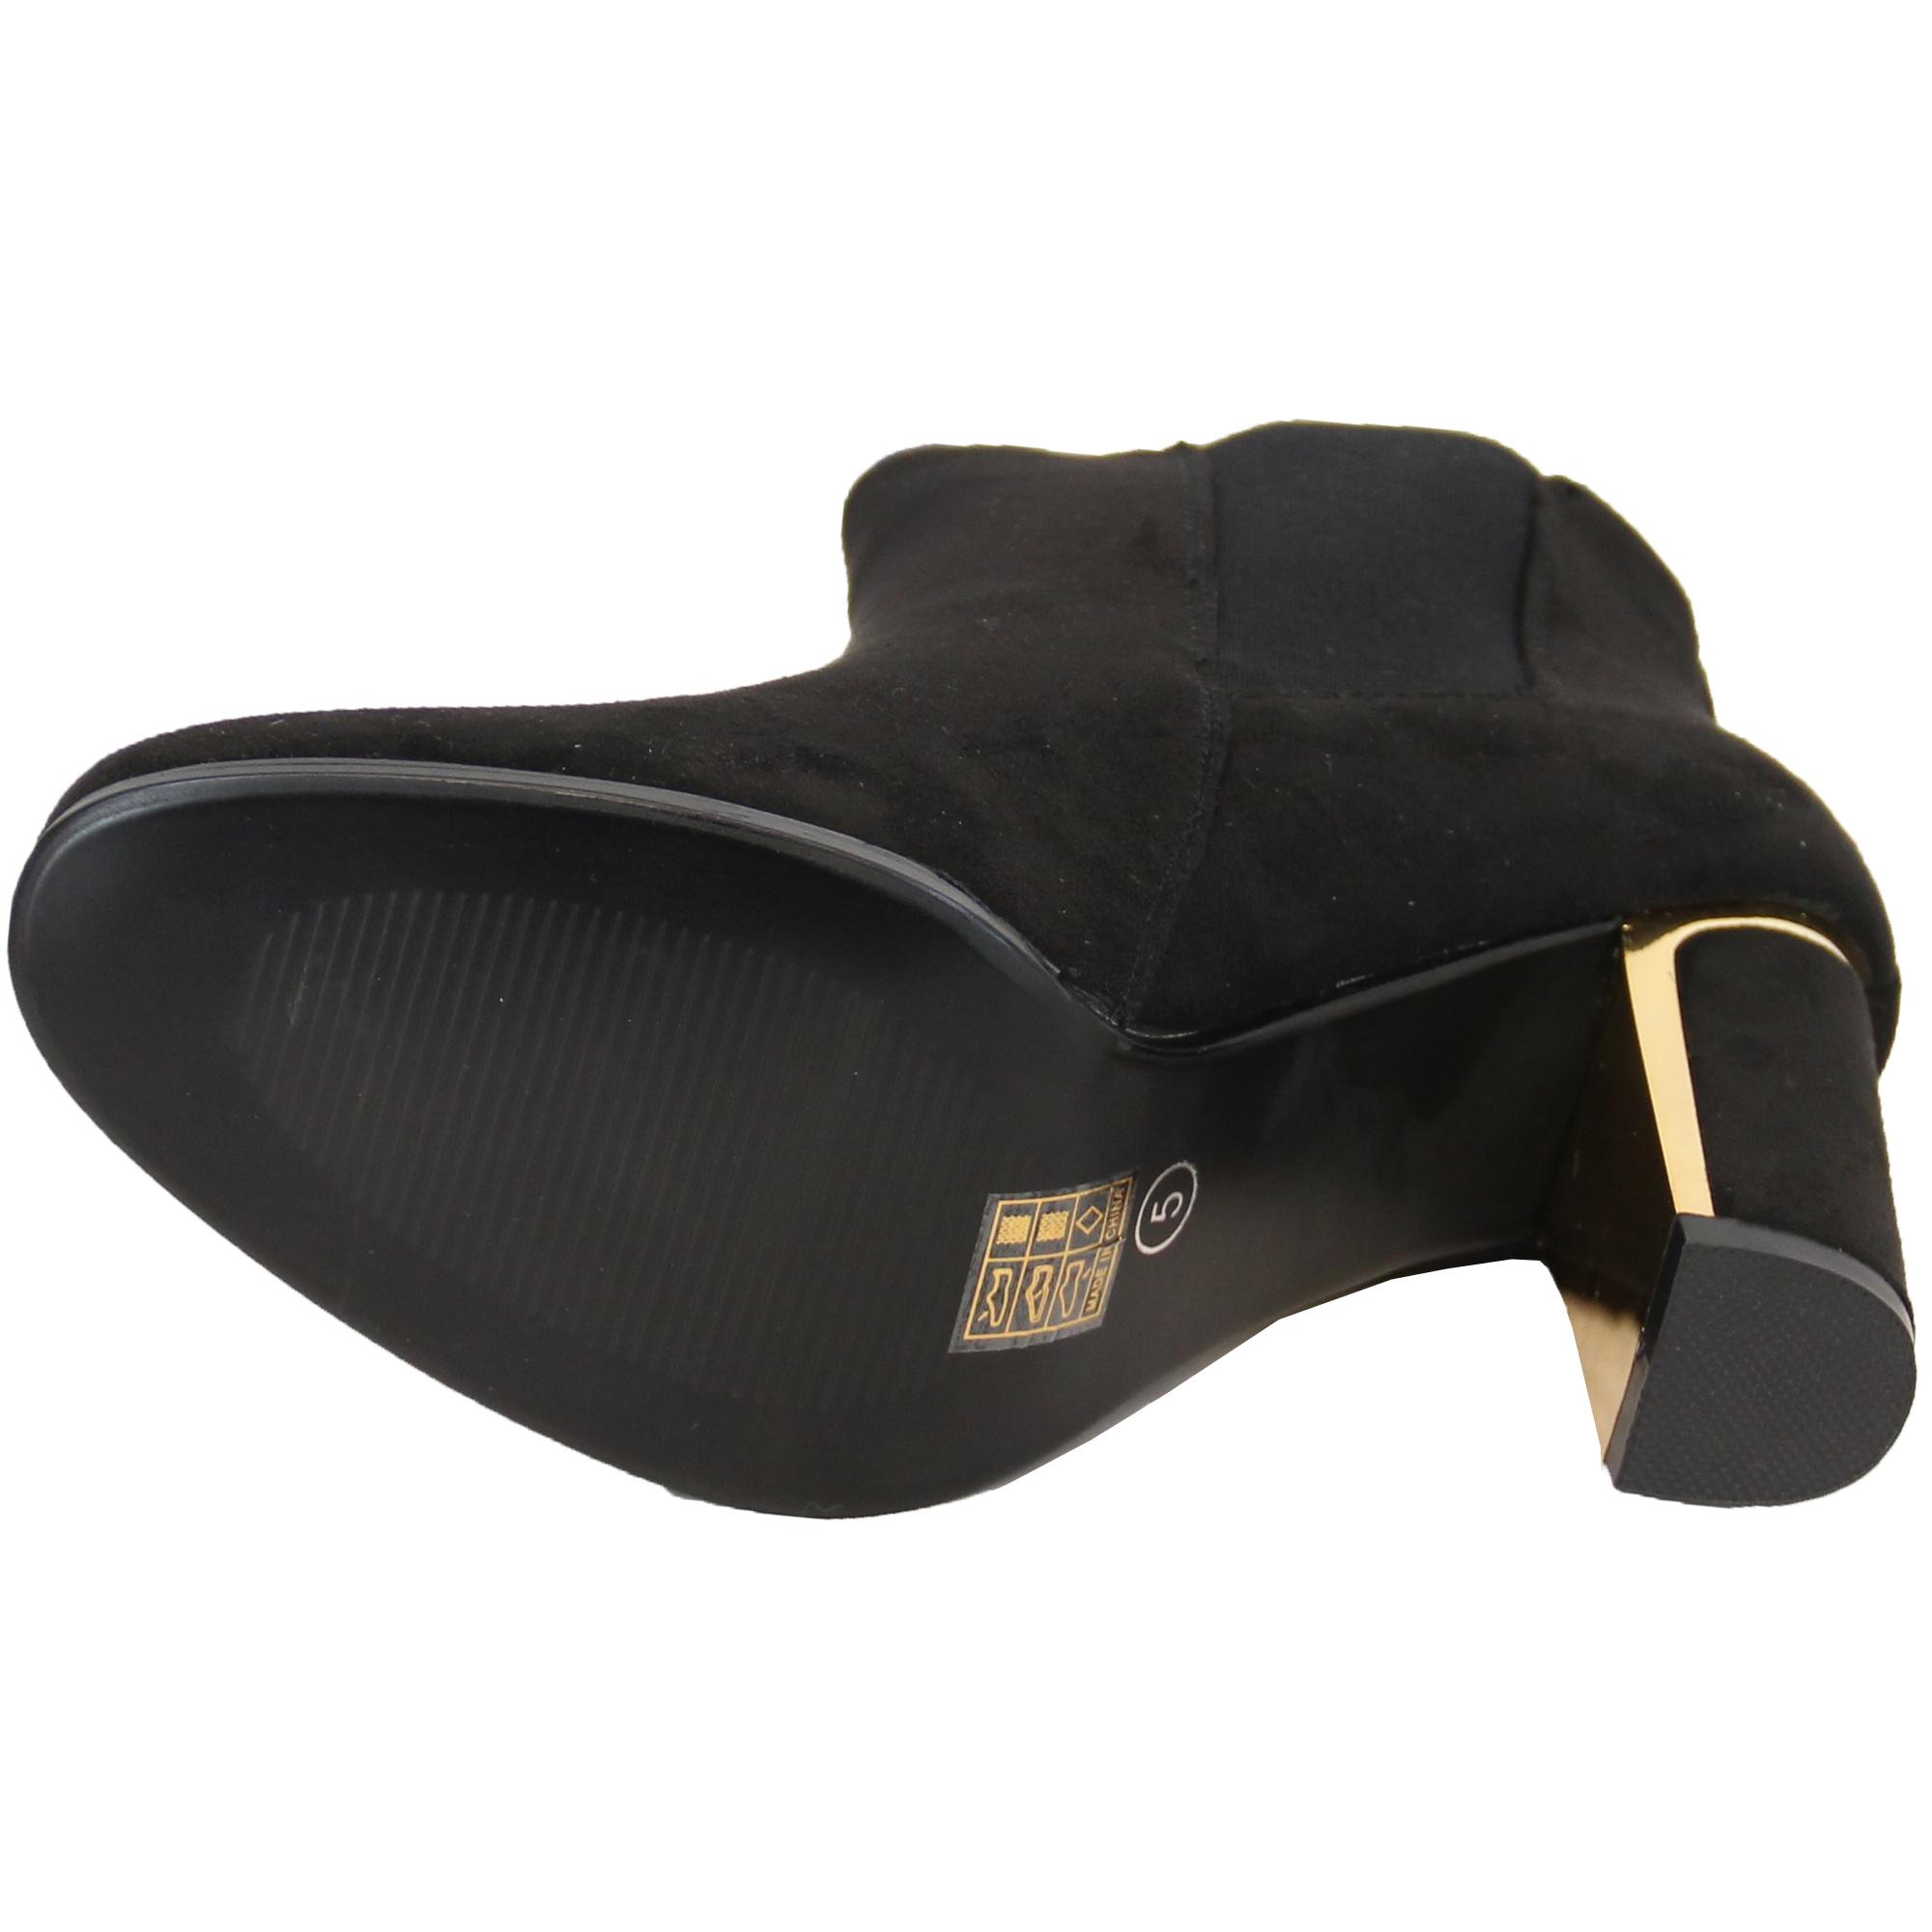 Ladies Chelsea Boots Womens Kelsi Shoes Suede Look Block Heel Snake Effect Party